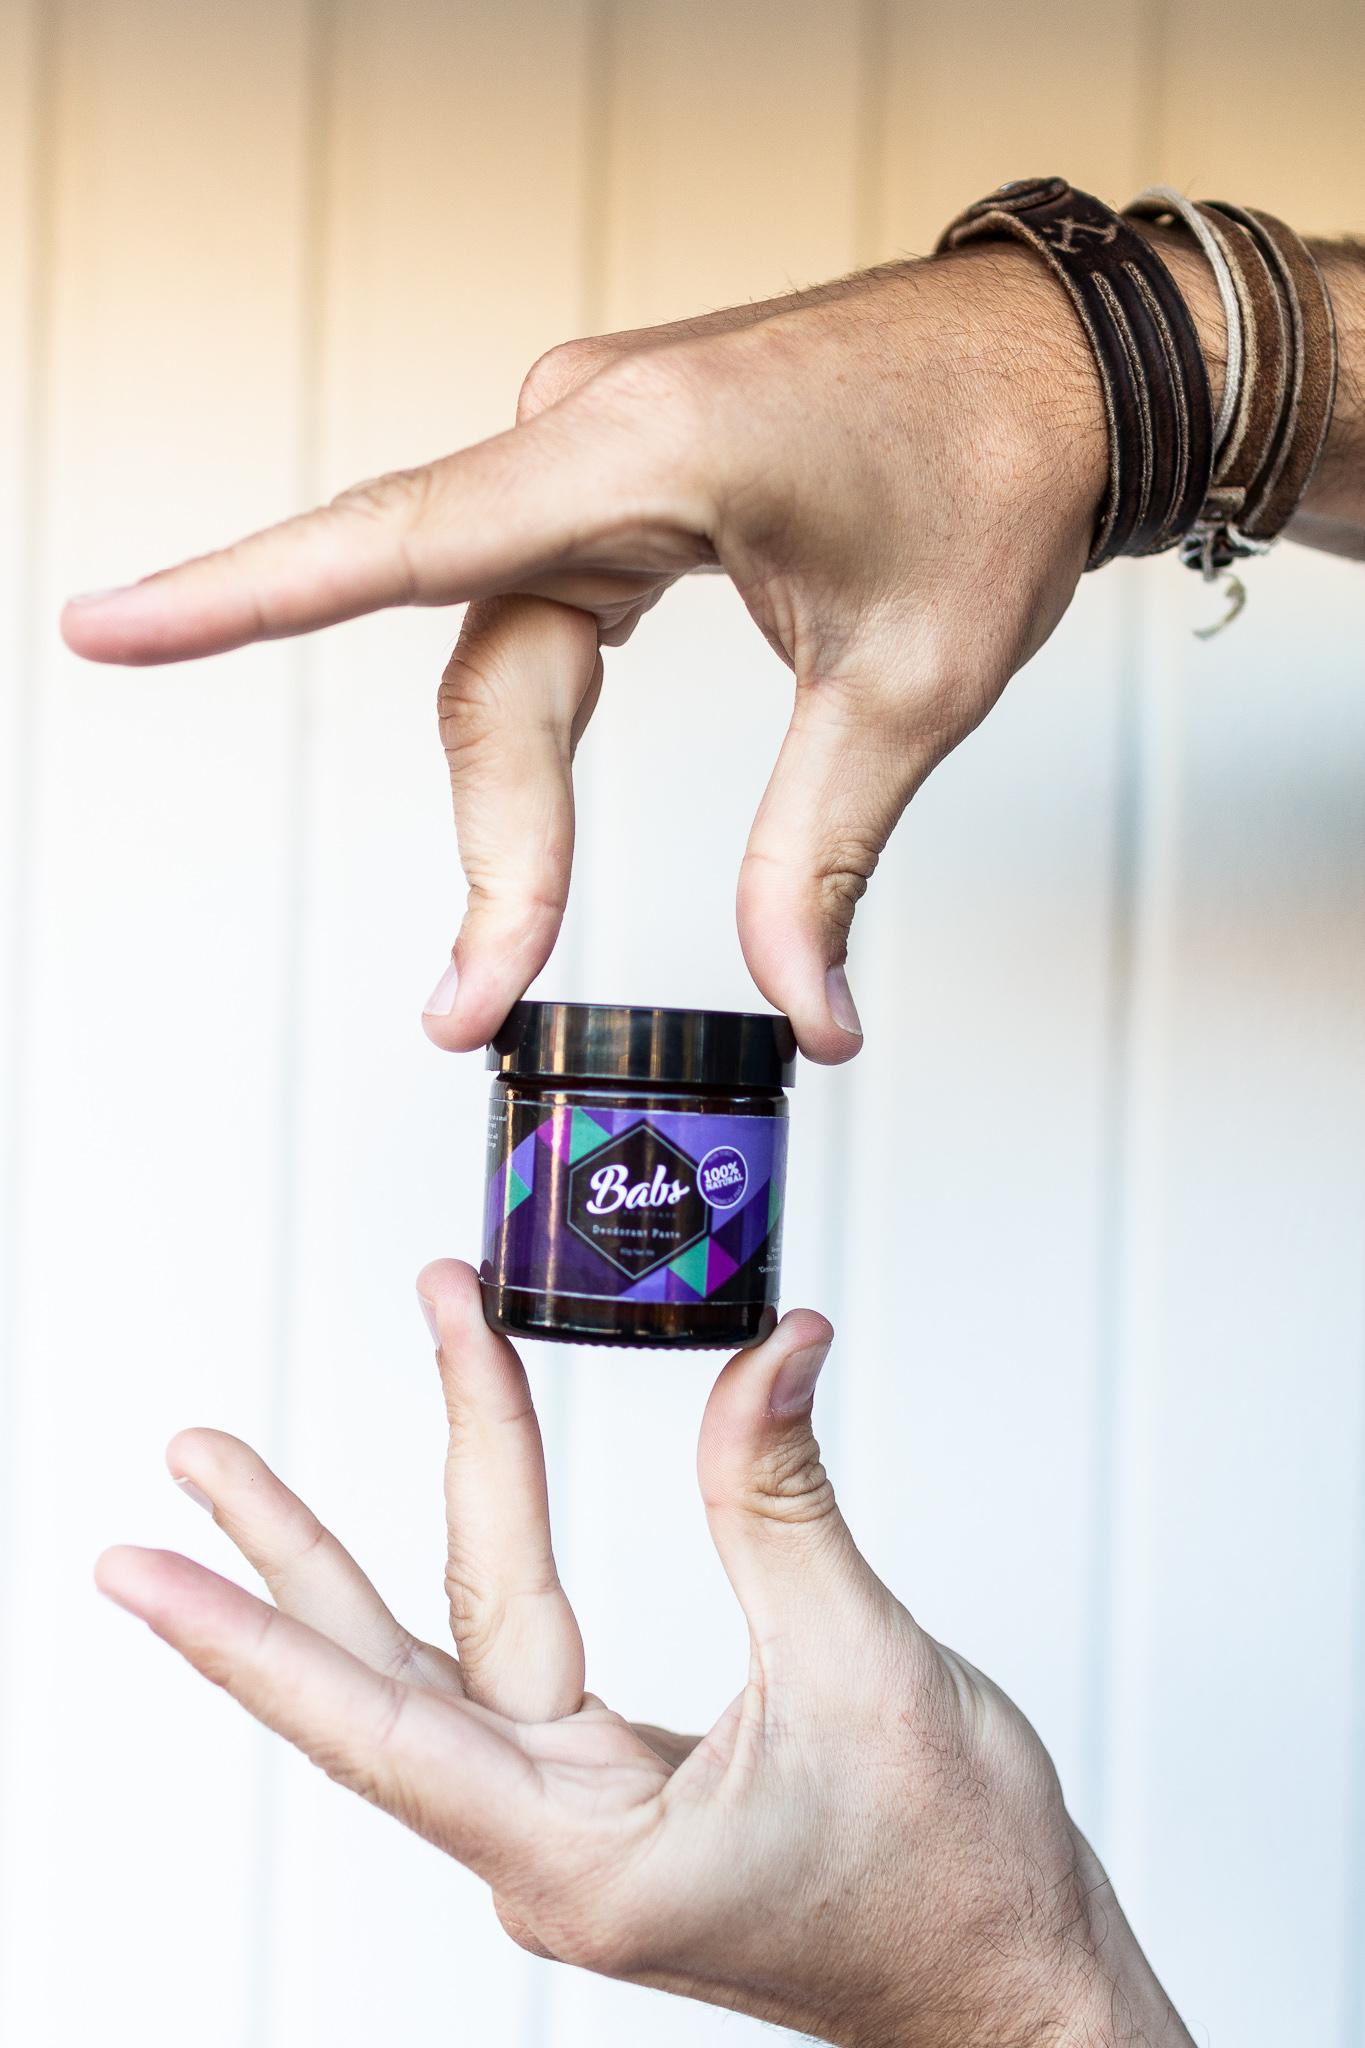 Babs Deodorant.jpg